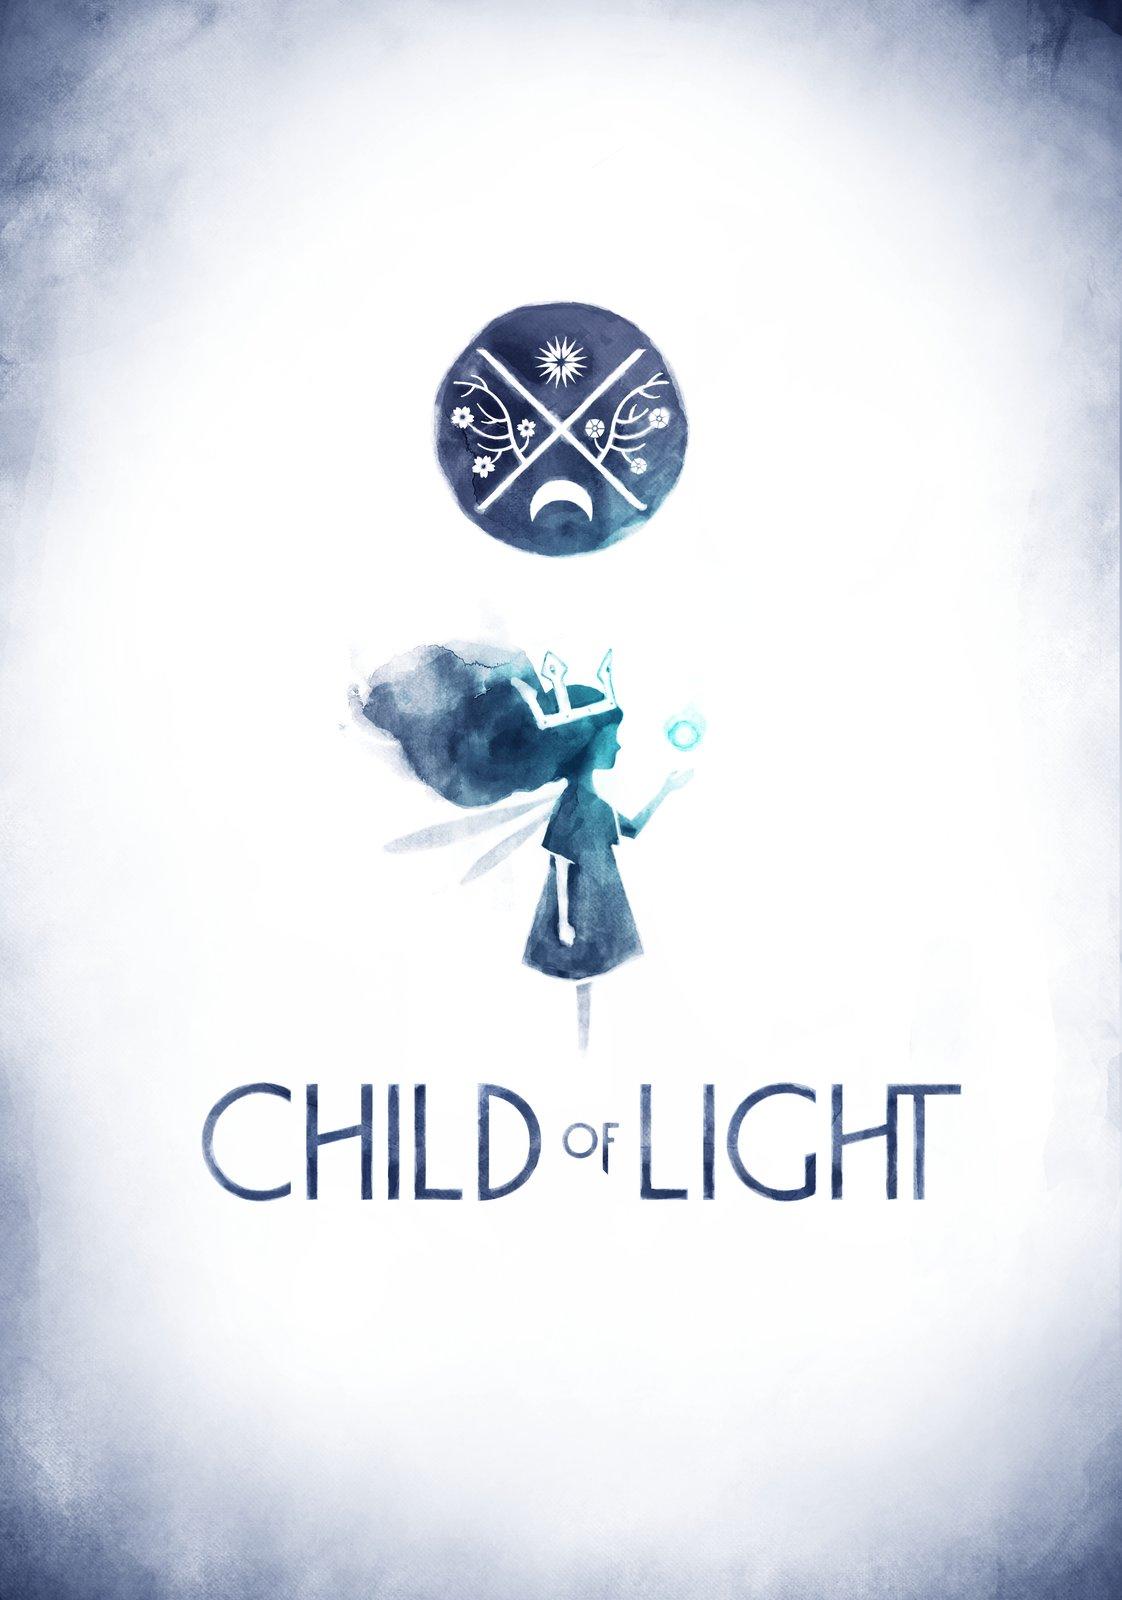 [XBOX 360]Child of Light (2014) RGH/JTAG - ITA